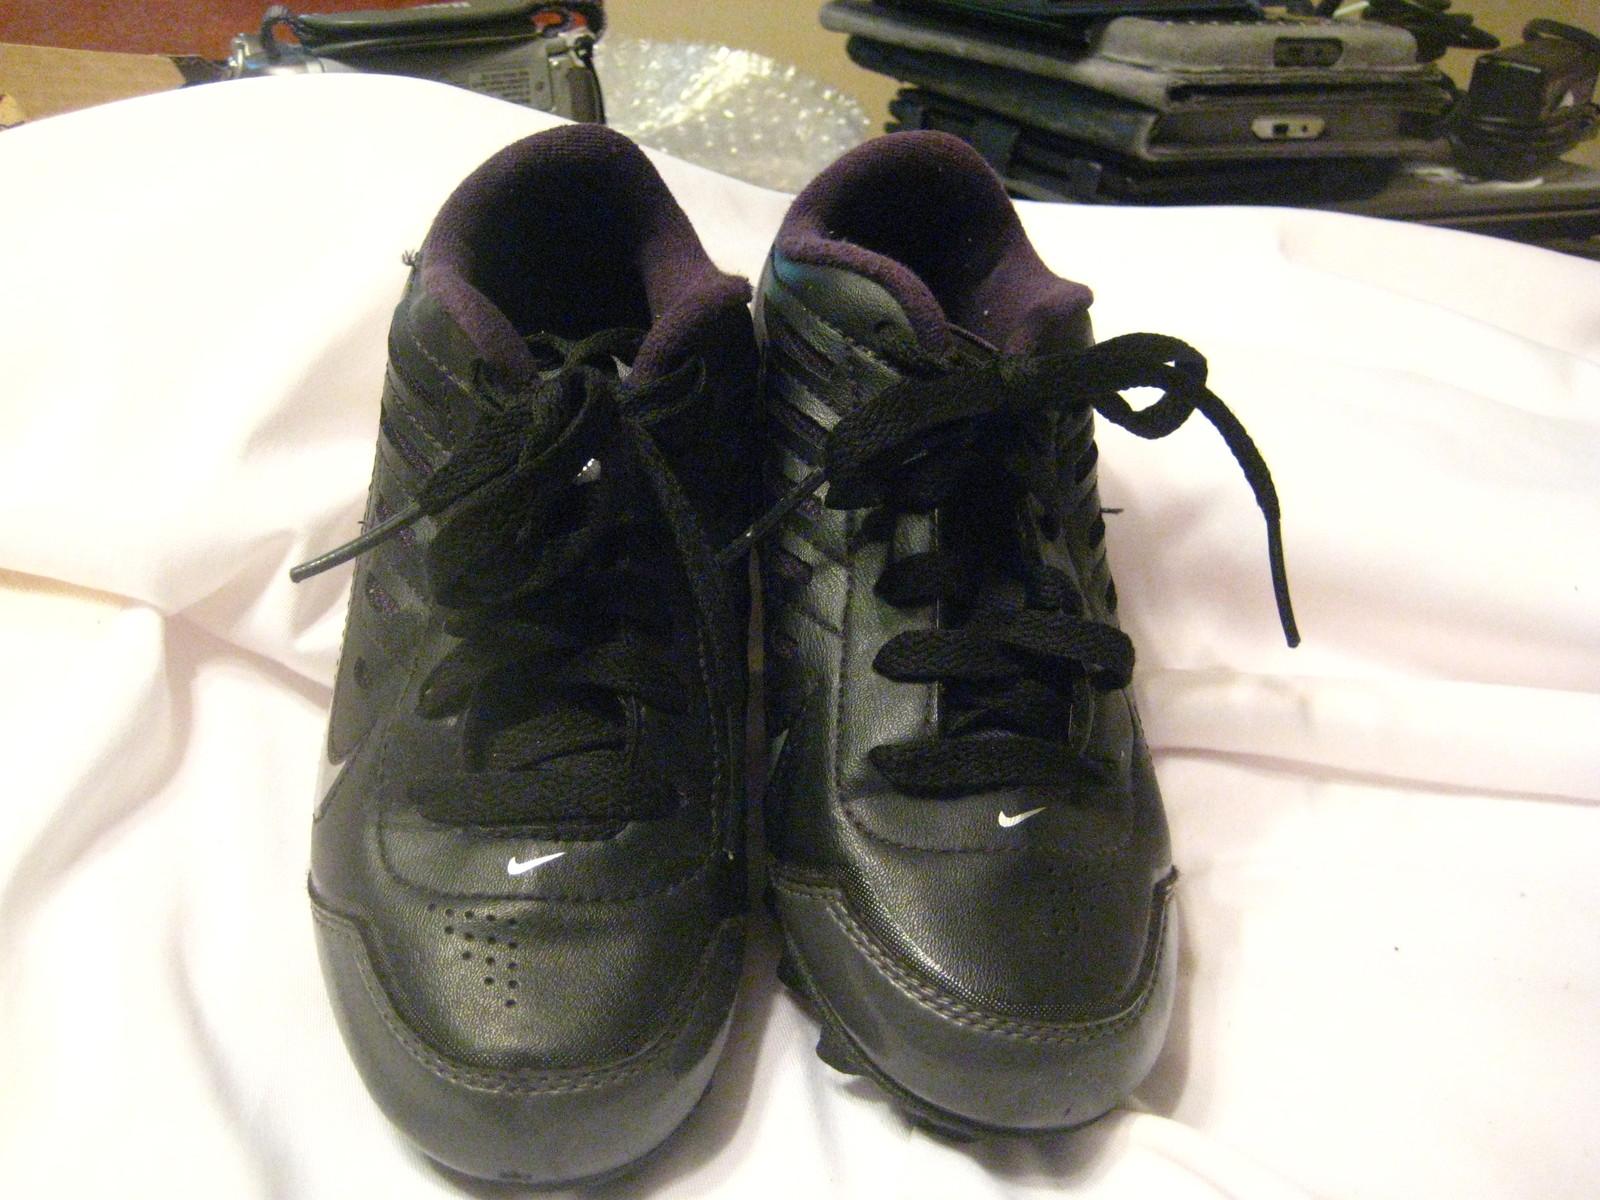 Nike YOUTH Landshark Legacy BG Black Field Multipurpose Shoes Cleats 13C